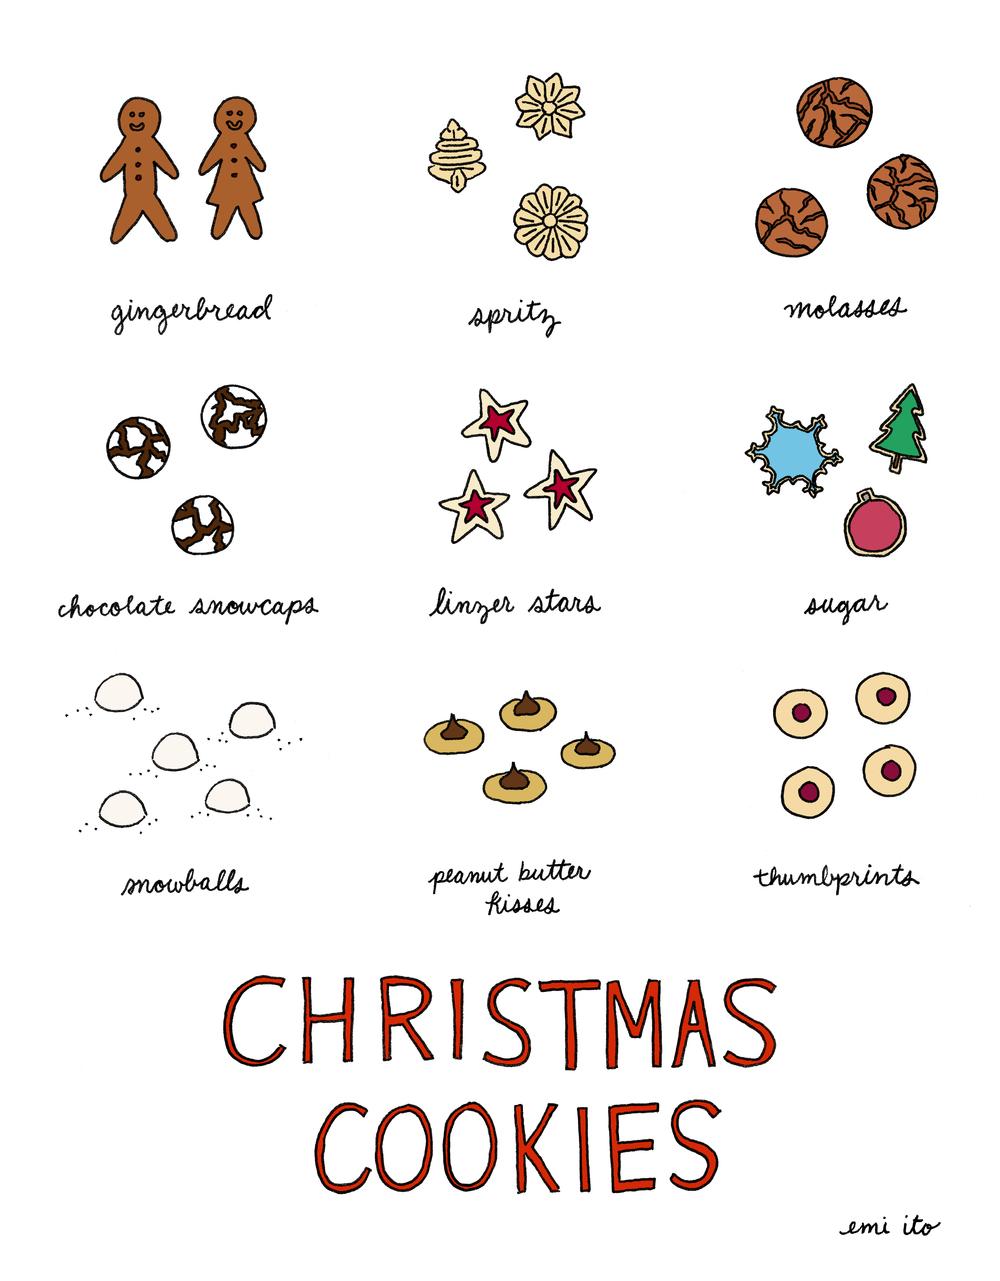 christmas cookies - emi ito illustration